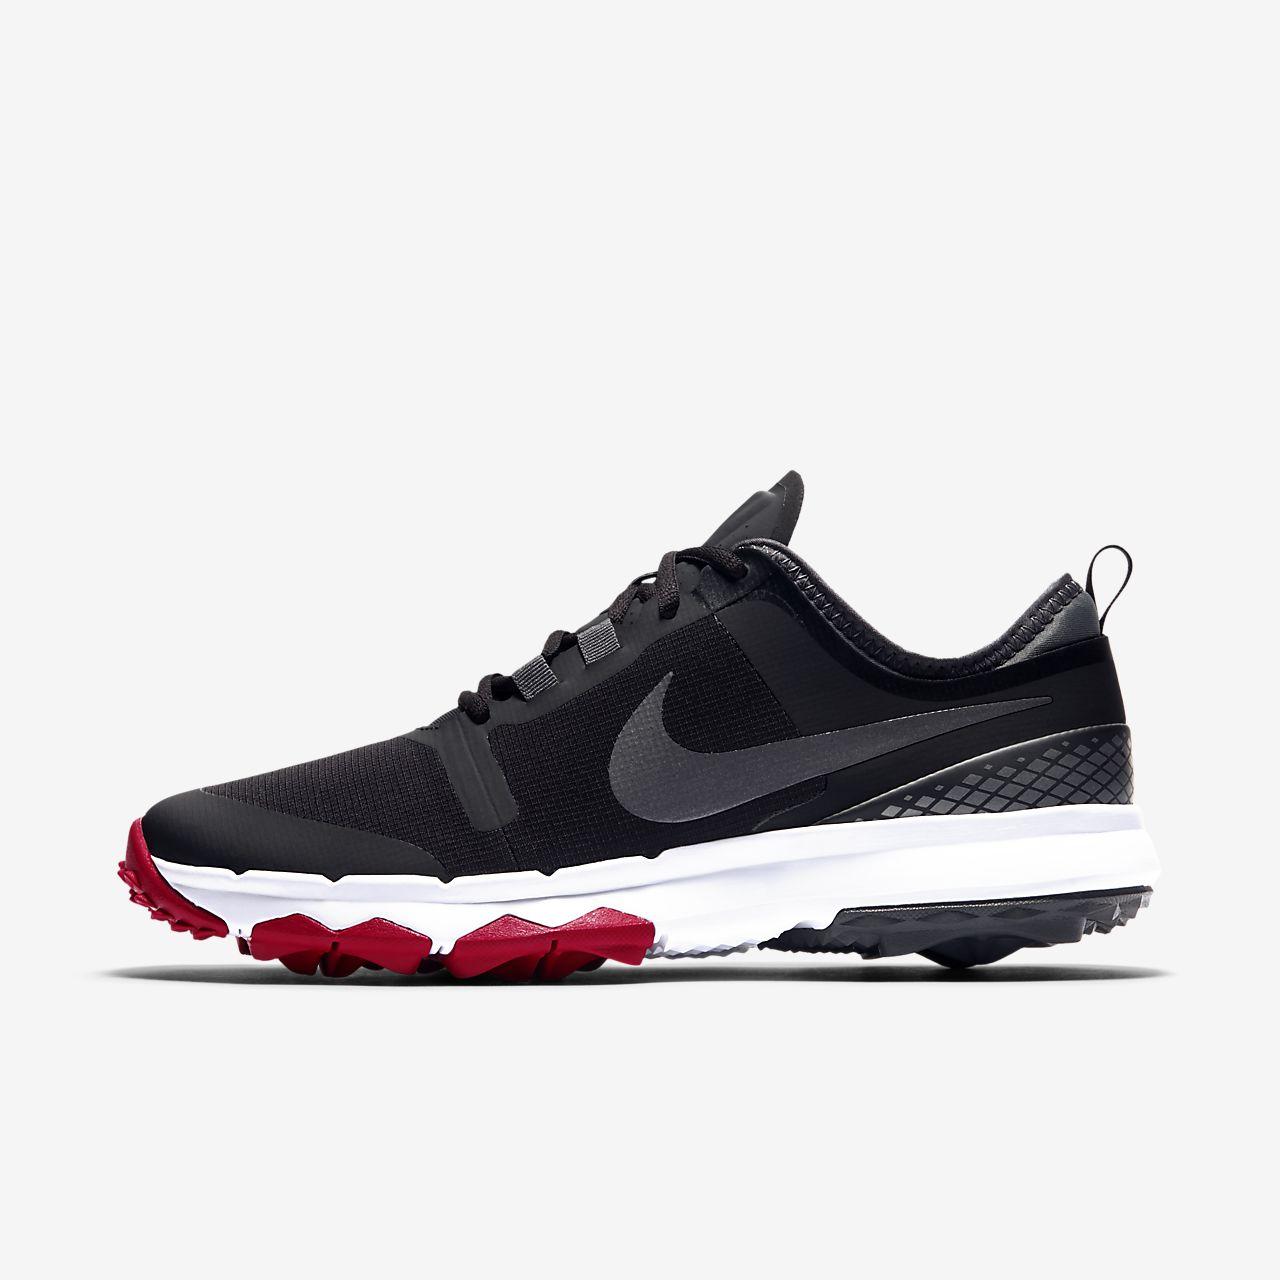 buy popular 46f21 3edac Nike Fi Impact 2 Scarpe da Golf Uomo Nero Black Cool Grey White Anthracite  - tualu.org